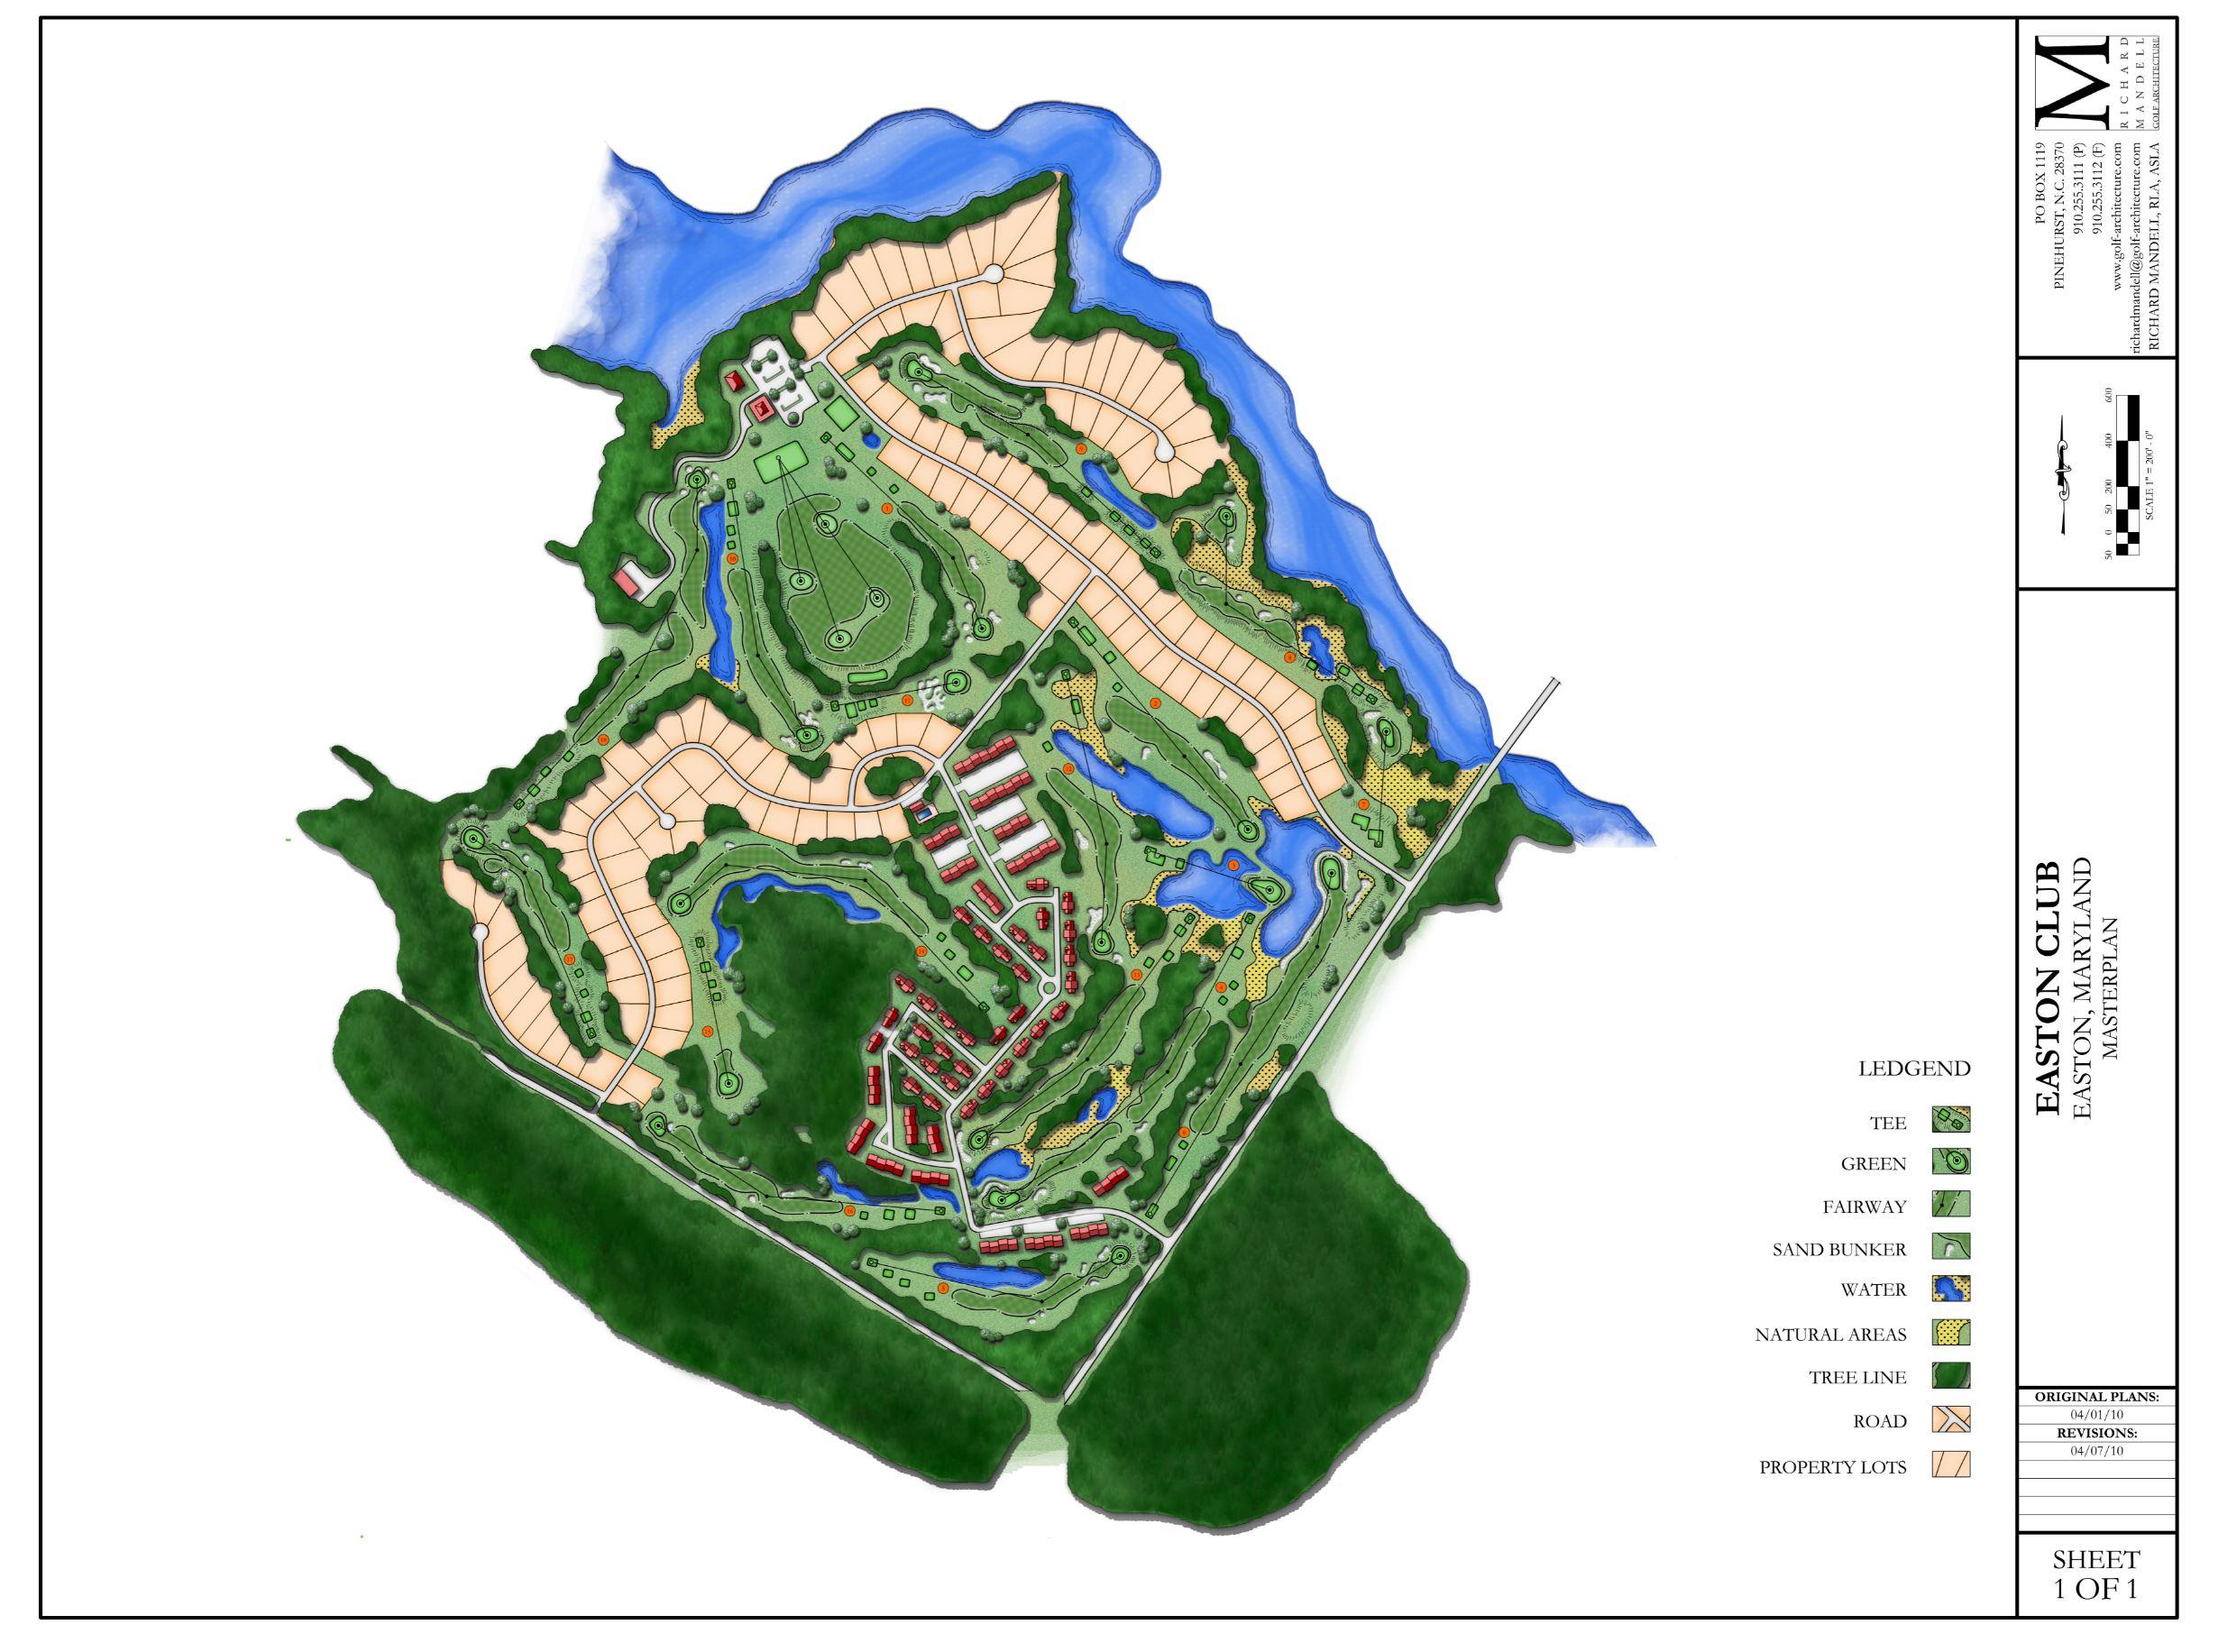 Easton Club Golf Course Master Plan